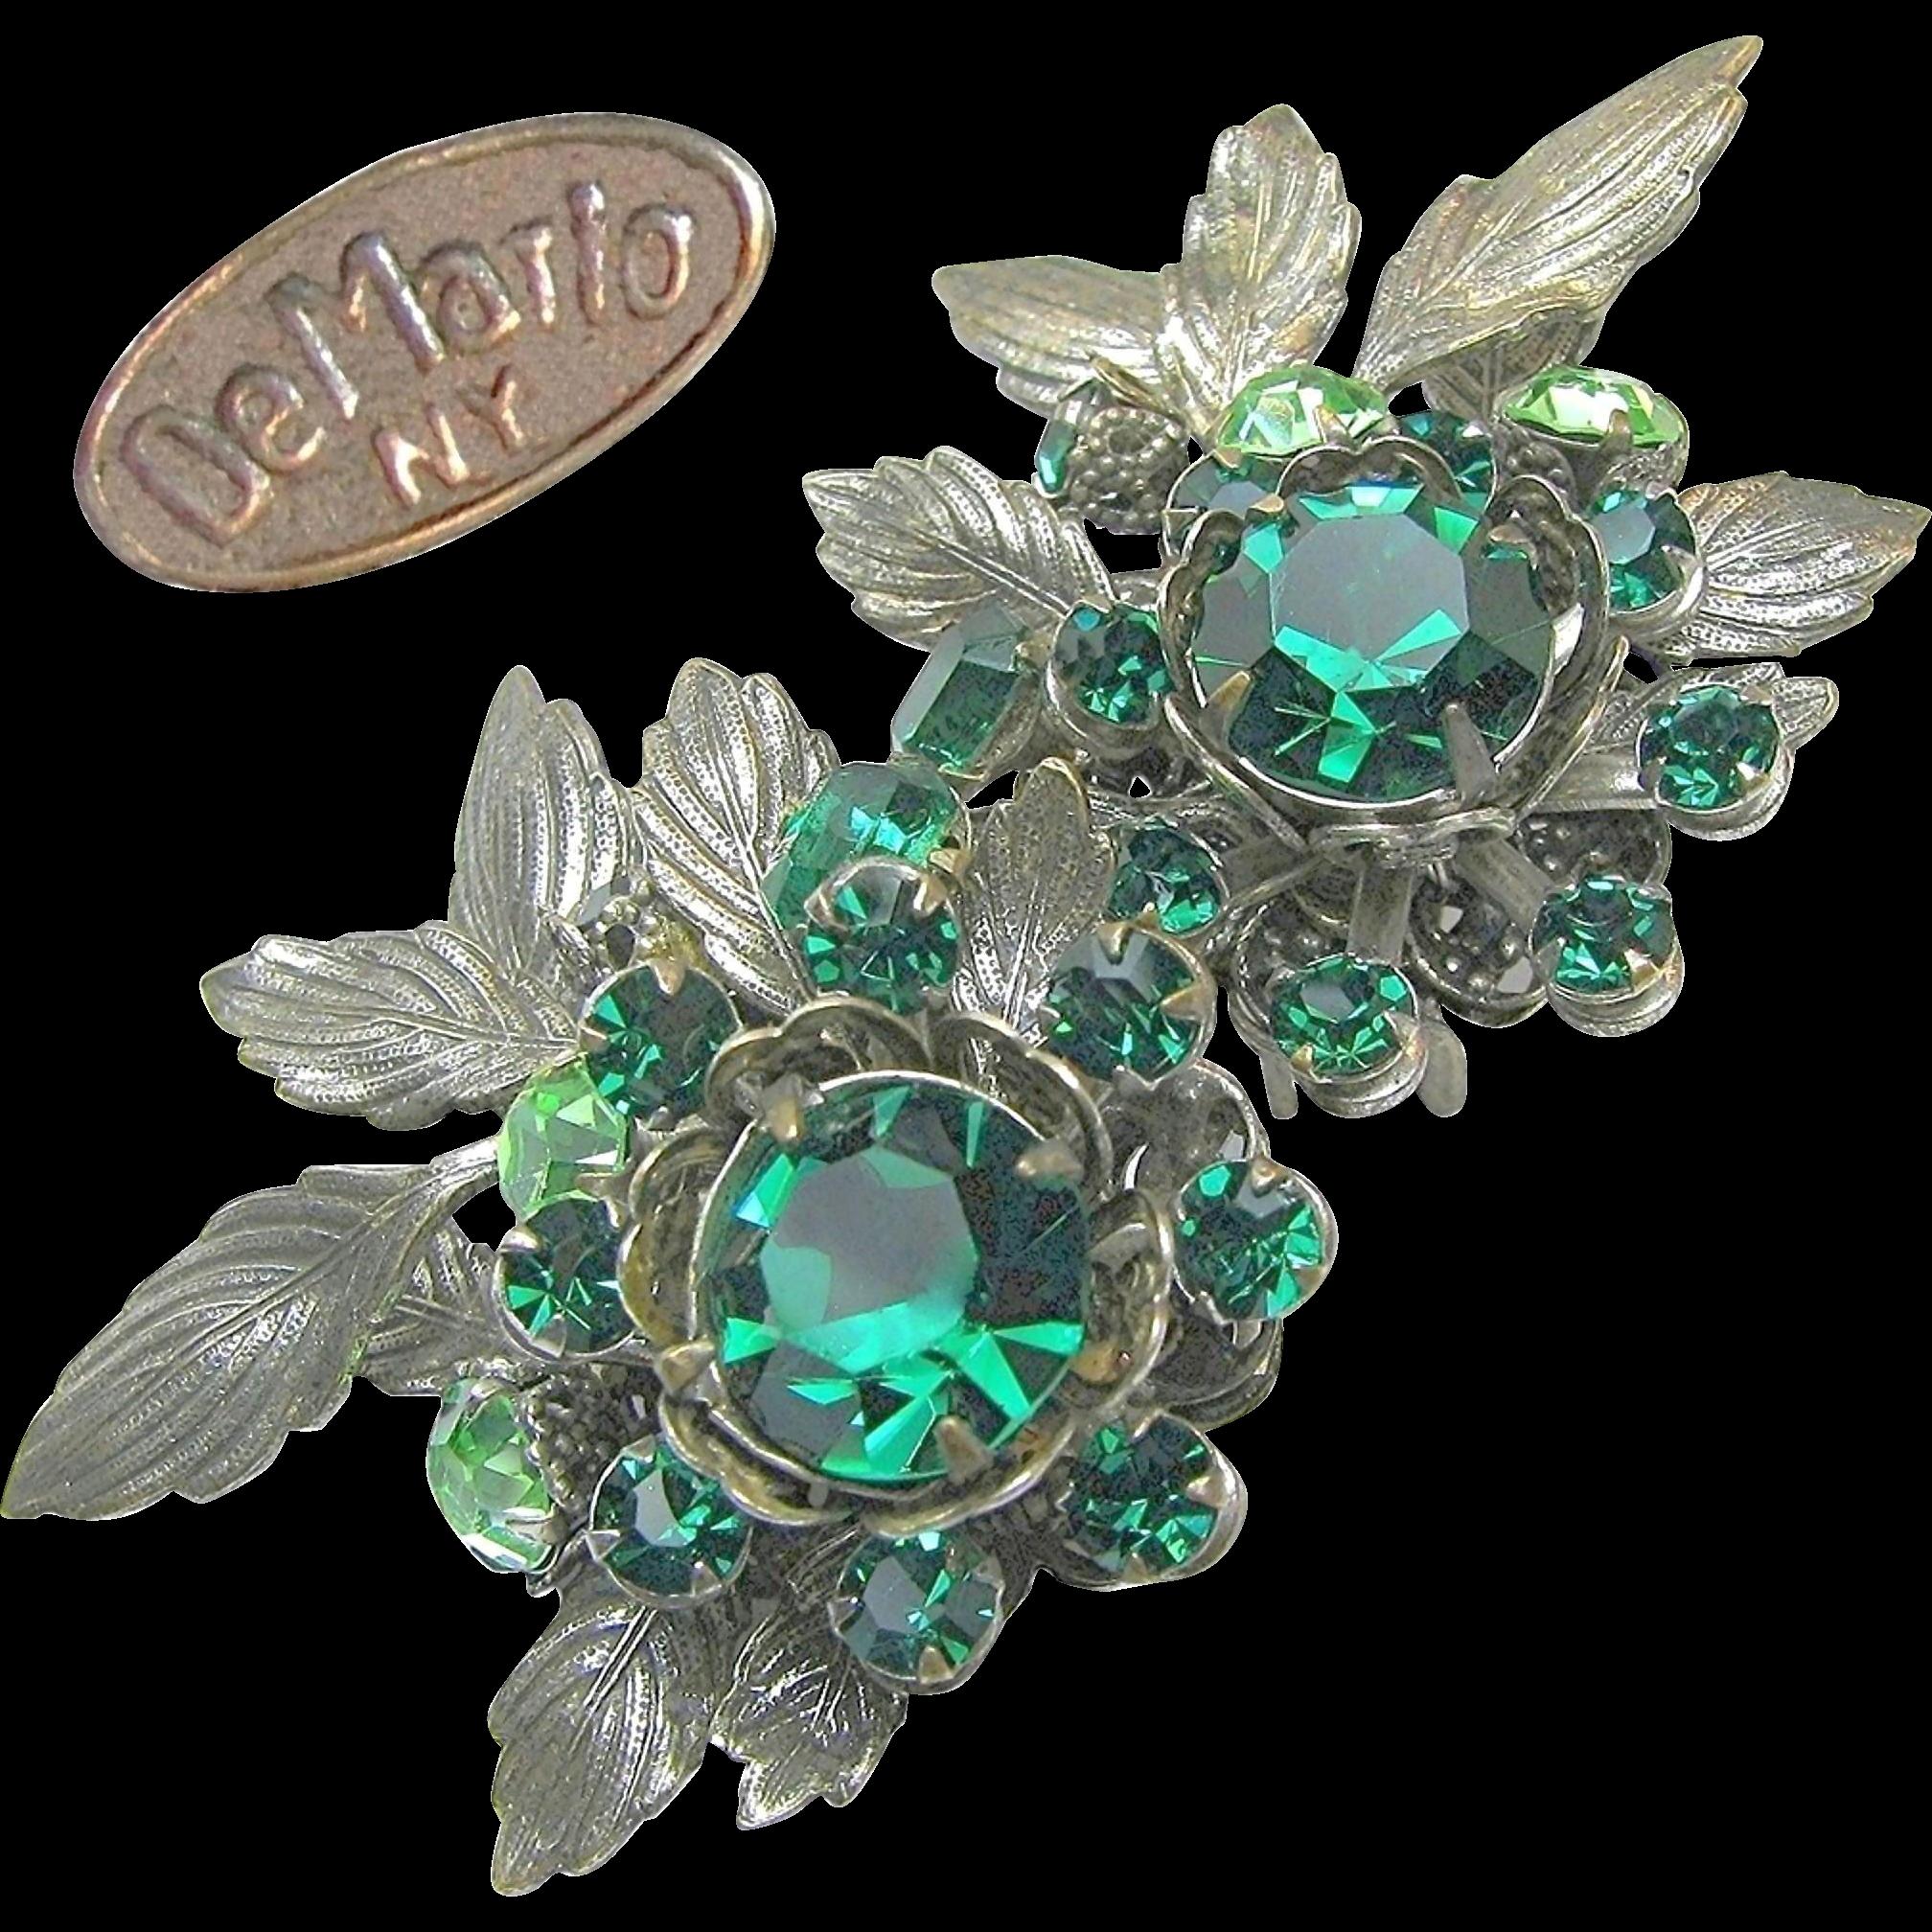 Green Rhinestone Large DeMARIO 'n Silver Gilt EARRINGS c.1950's